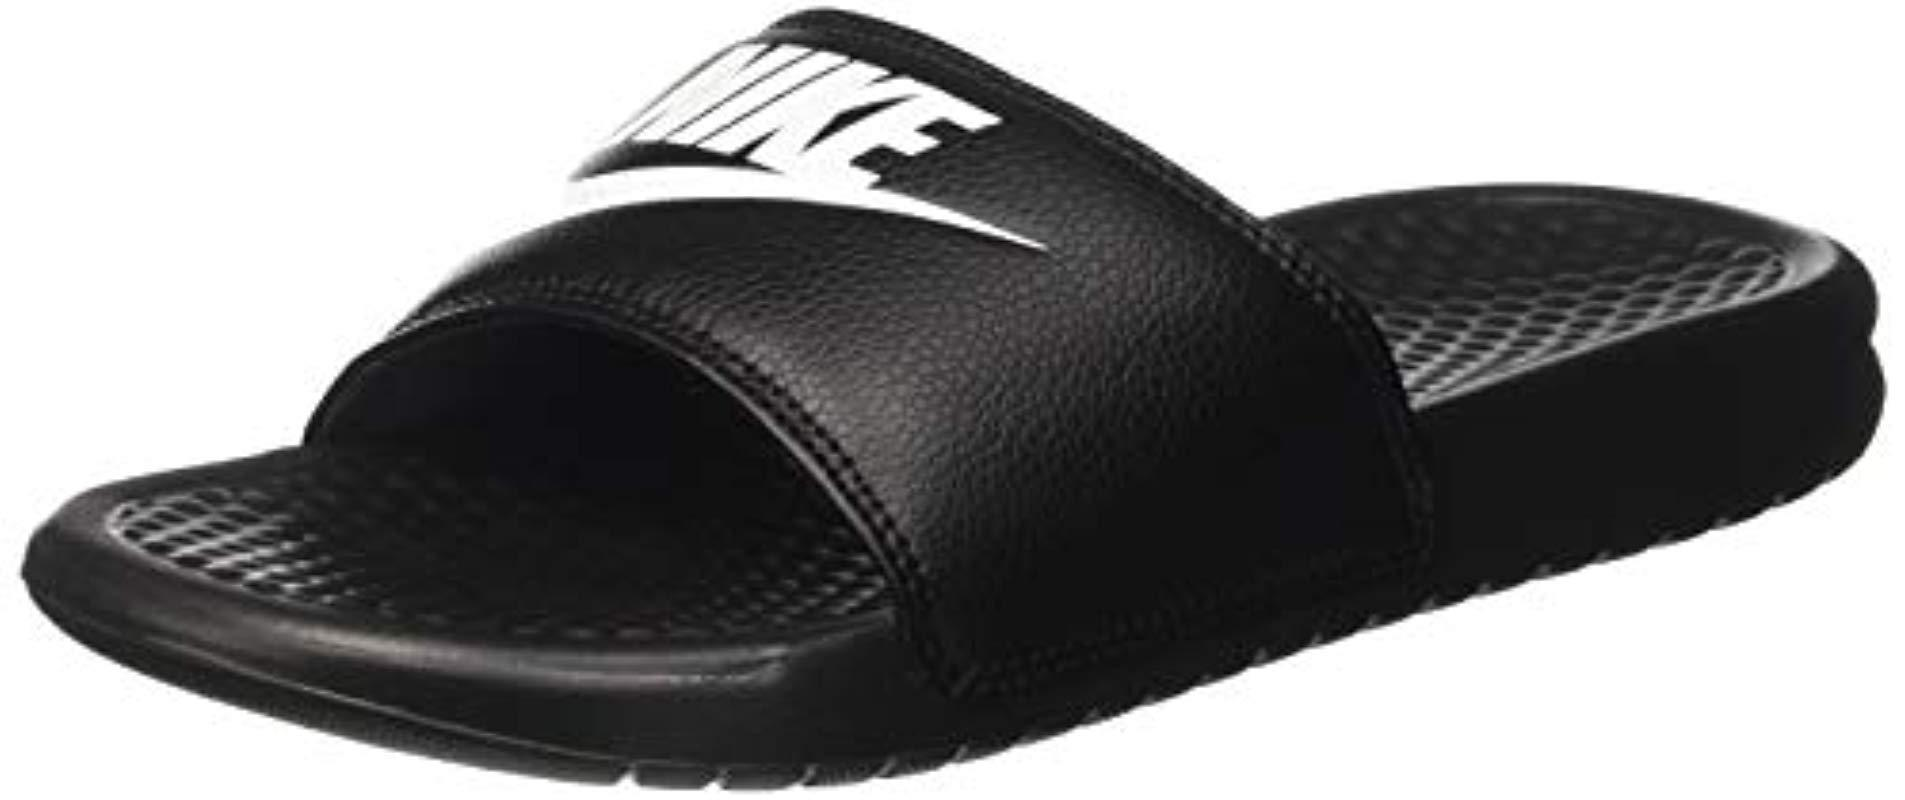 Nike  s Benassi Blue Flip Flops in Black for Men - Save 53% - Lyst 0fbed1ae1